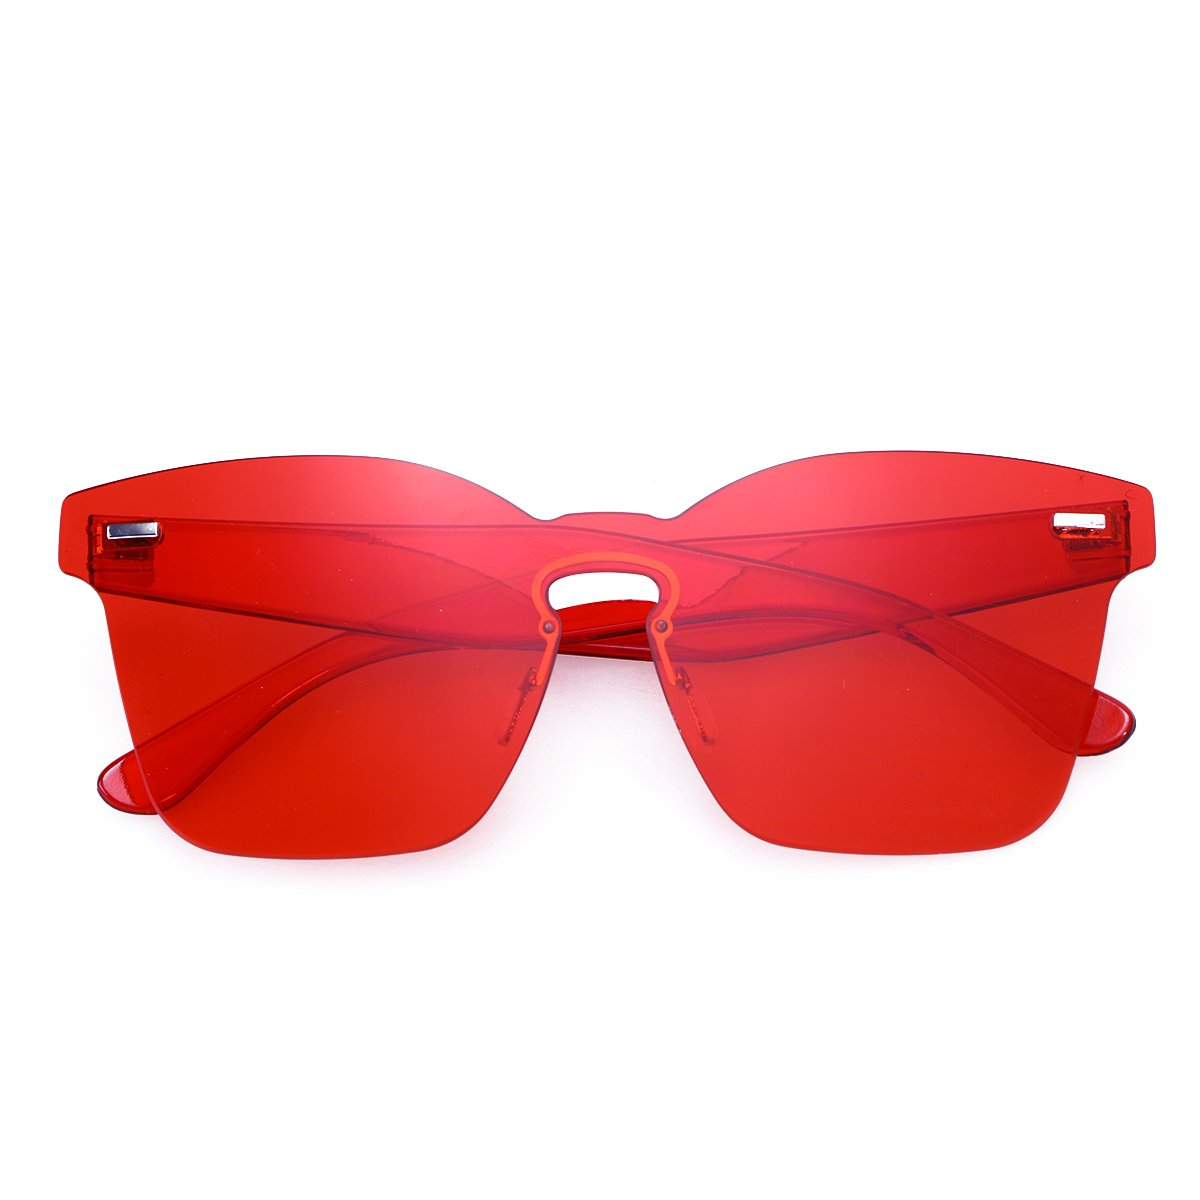 ed2f71e3844f OULII Rimless Sunglasses Novelty Pratical Beach Seaside Sunglass Mirror  Summer Eyewear for Men Women (Red) at Amazon Women's Clothing store: